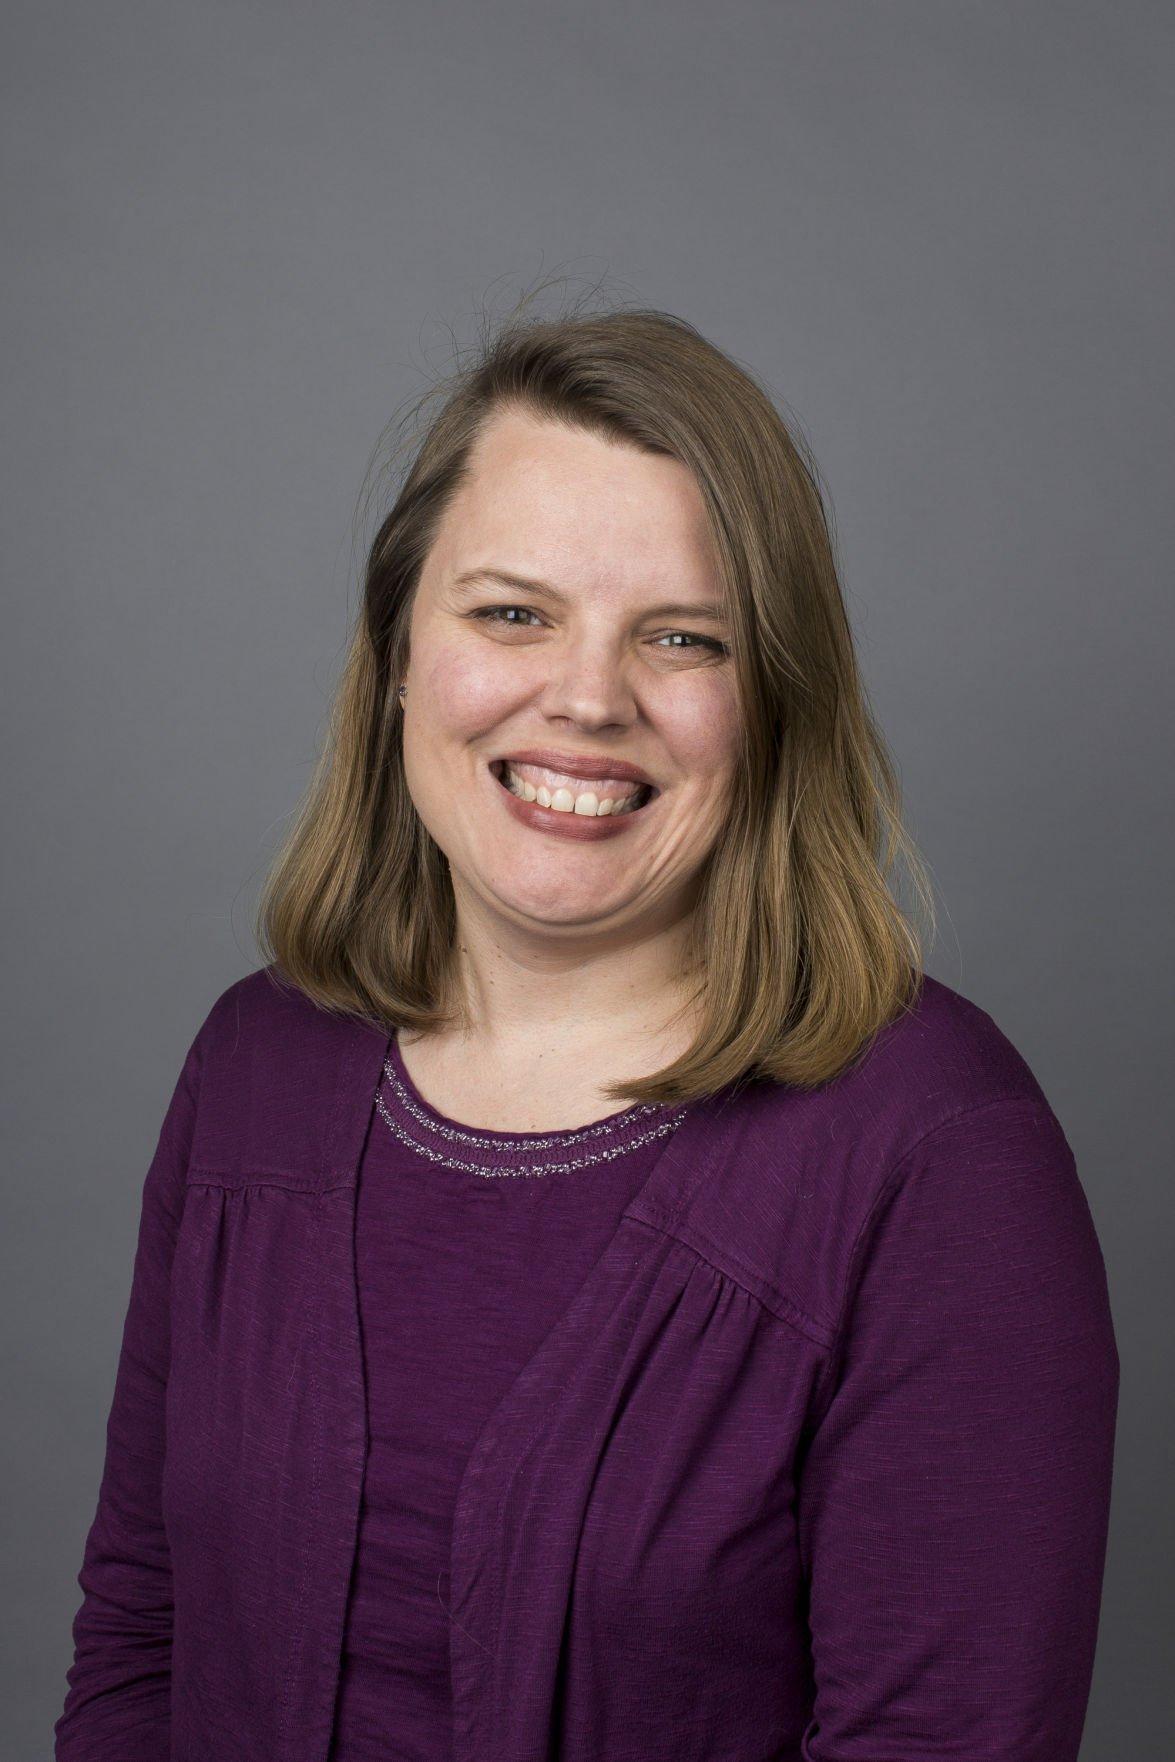 Lori Lundblad